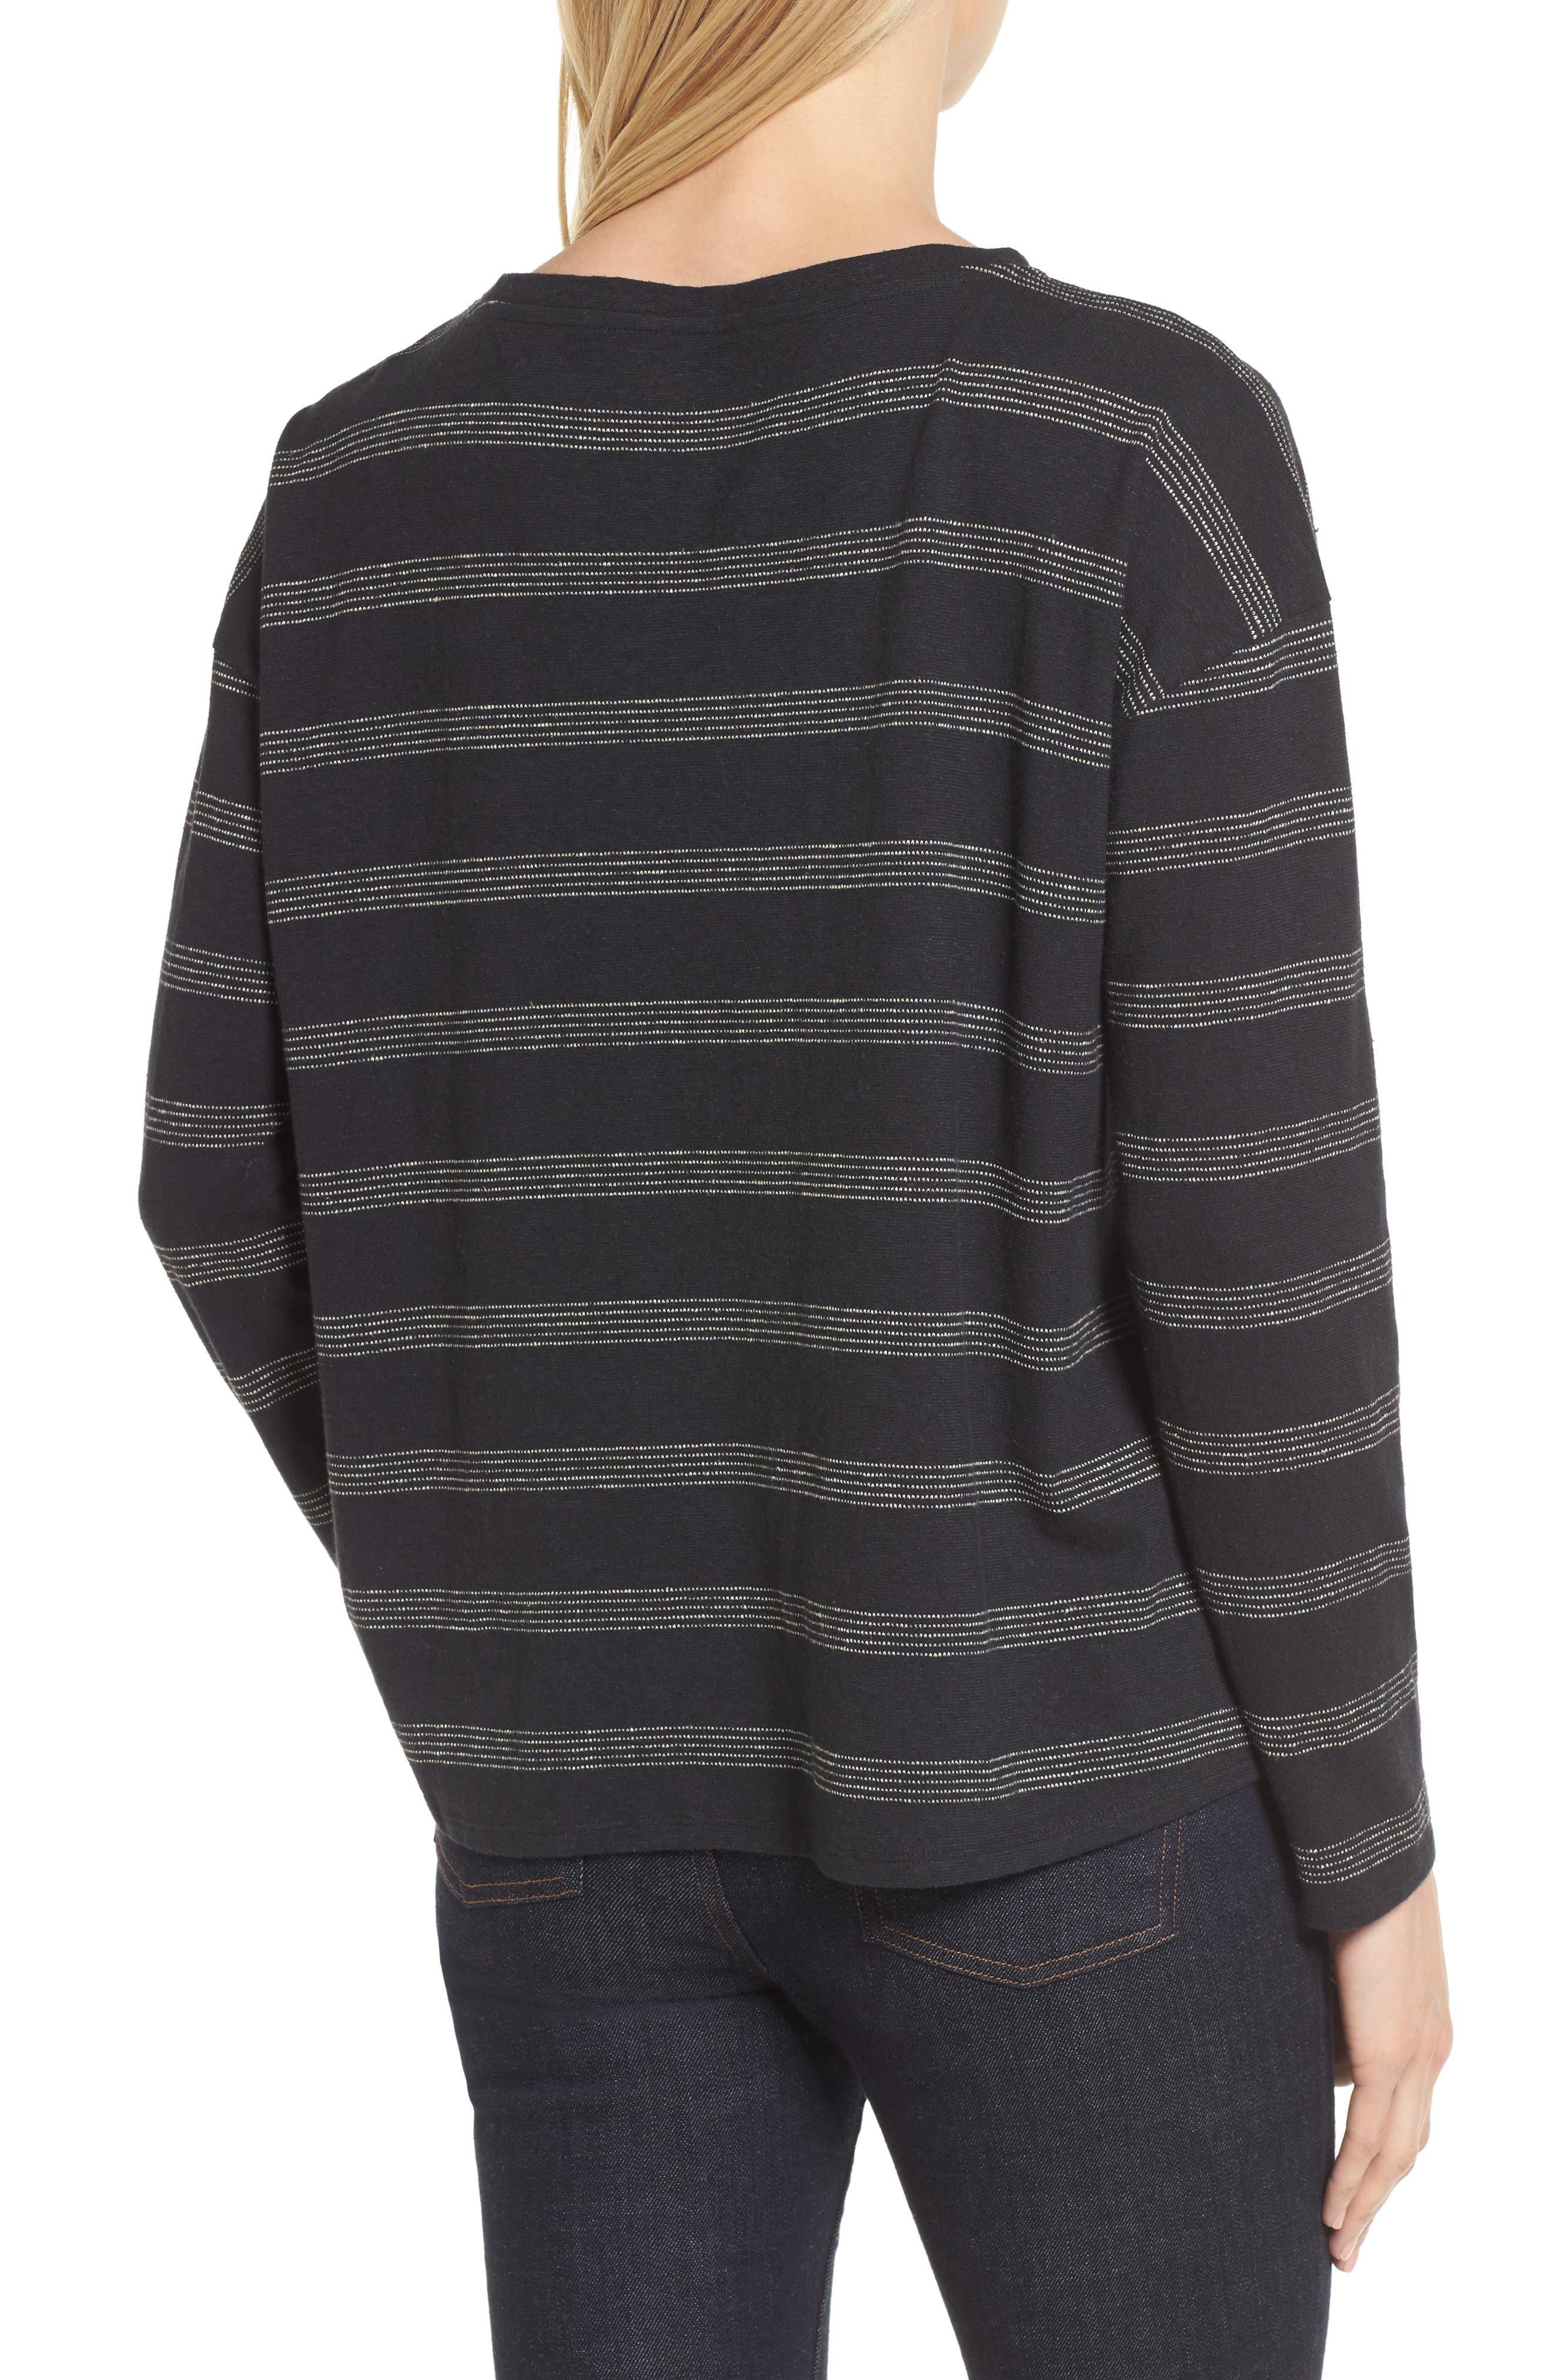 Stripe Hemp & Organic Cotton Top,                             Alternate thumbnail 2, color,                             Black